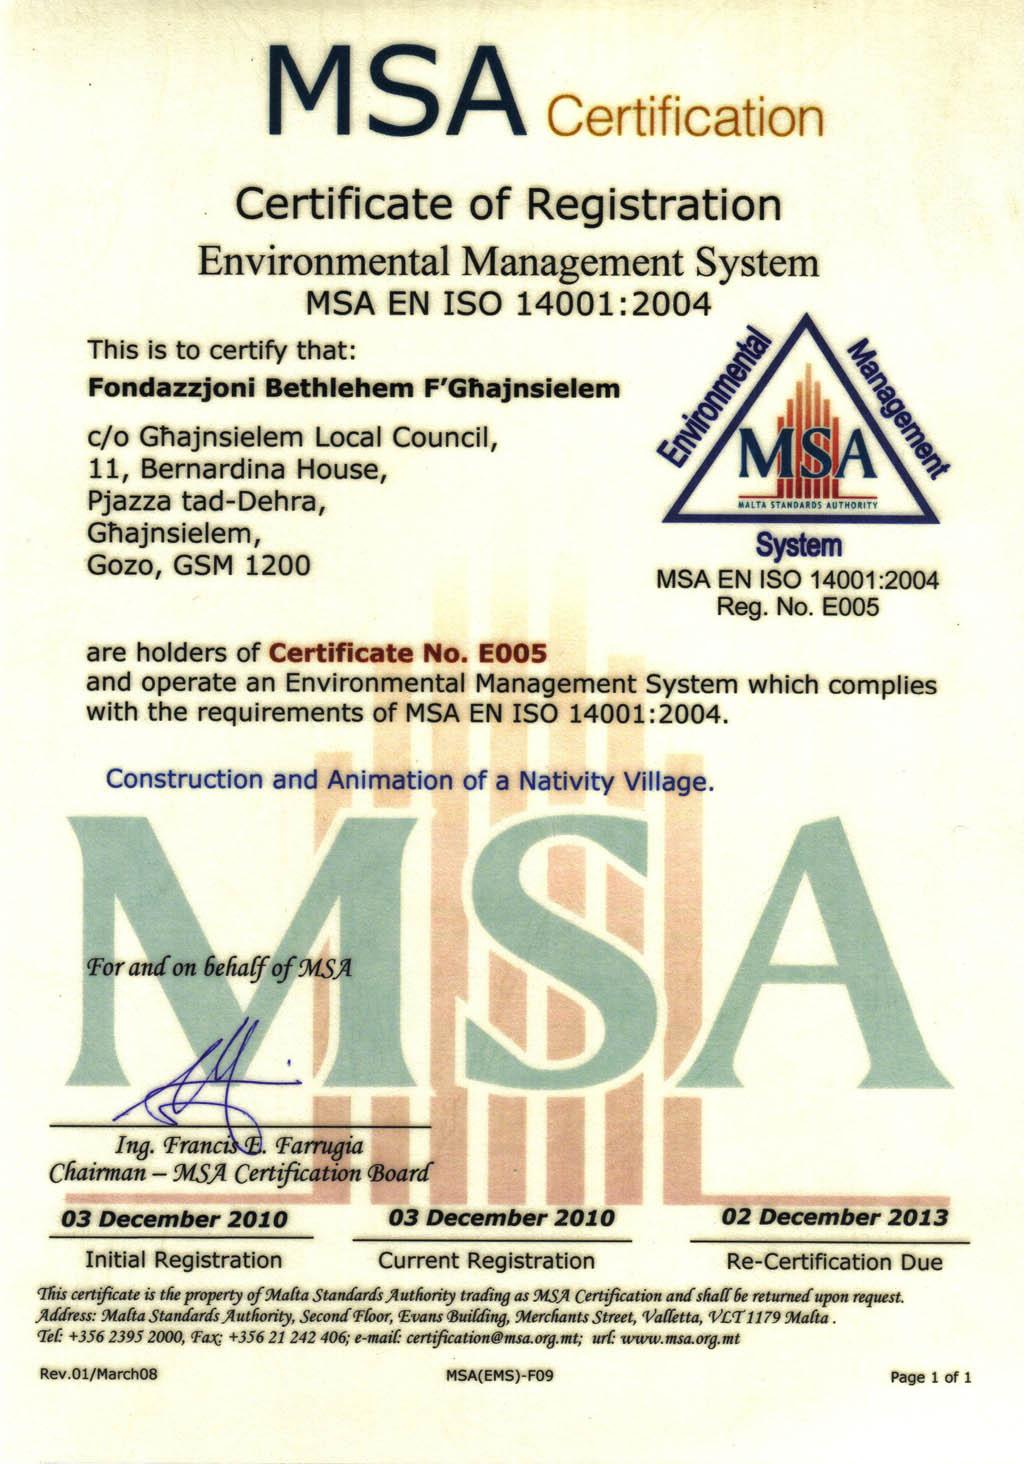 Bethlehem fghajnsielem the environmental management system of the fondazzjoni bethlehem fgajnsielem has been certified msa en iso 140012004 by the malta standards authority xflitez Choice Image